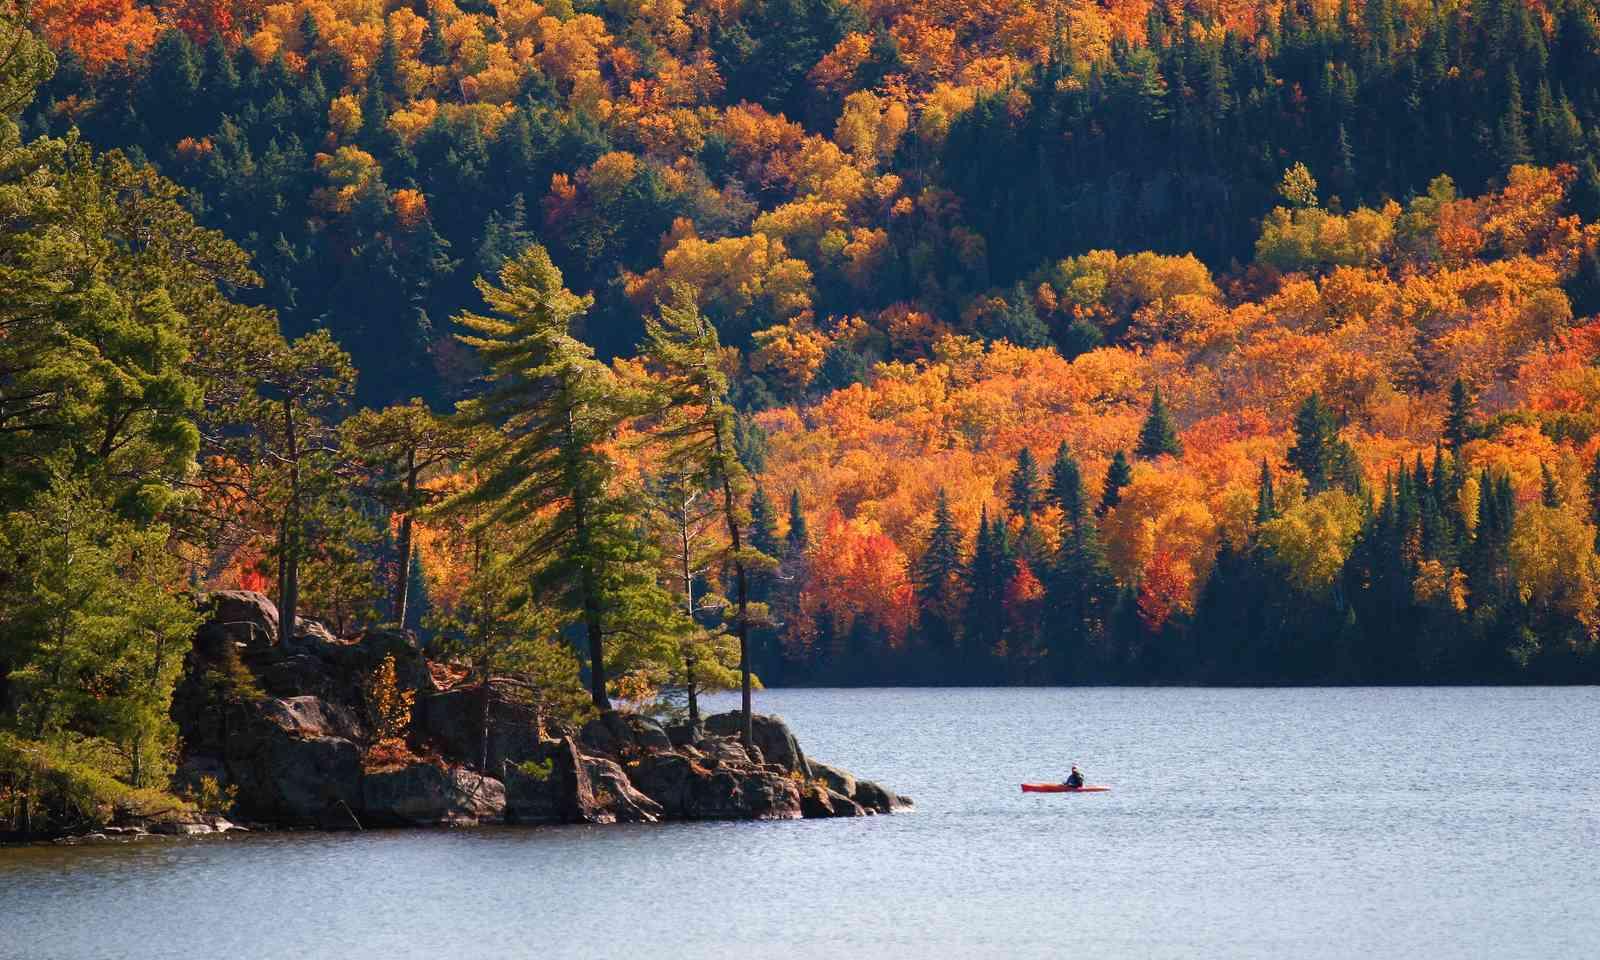 Kayaking in Canada (Shutterstock.com)